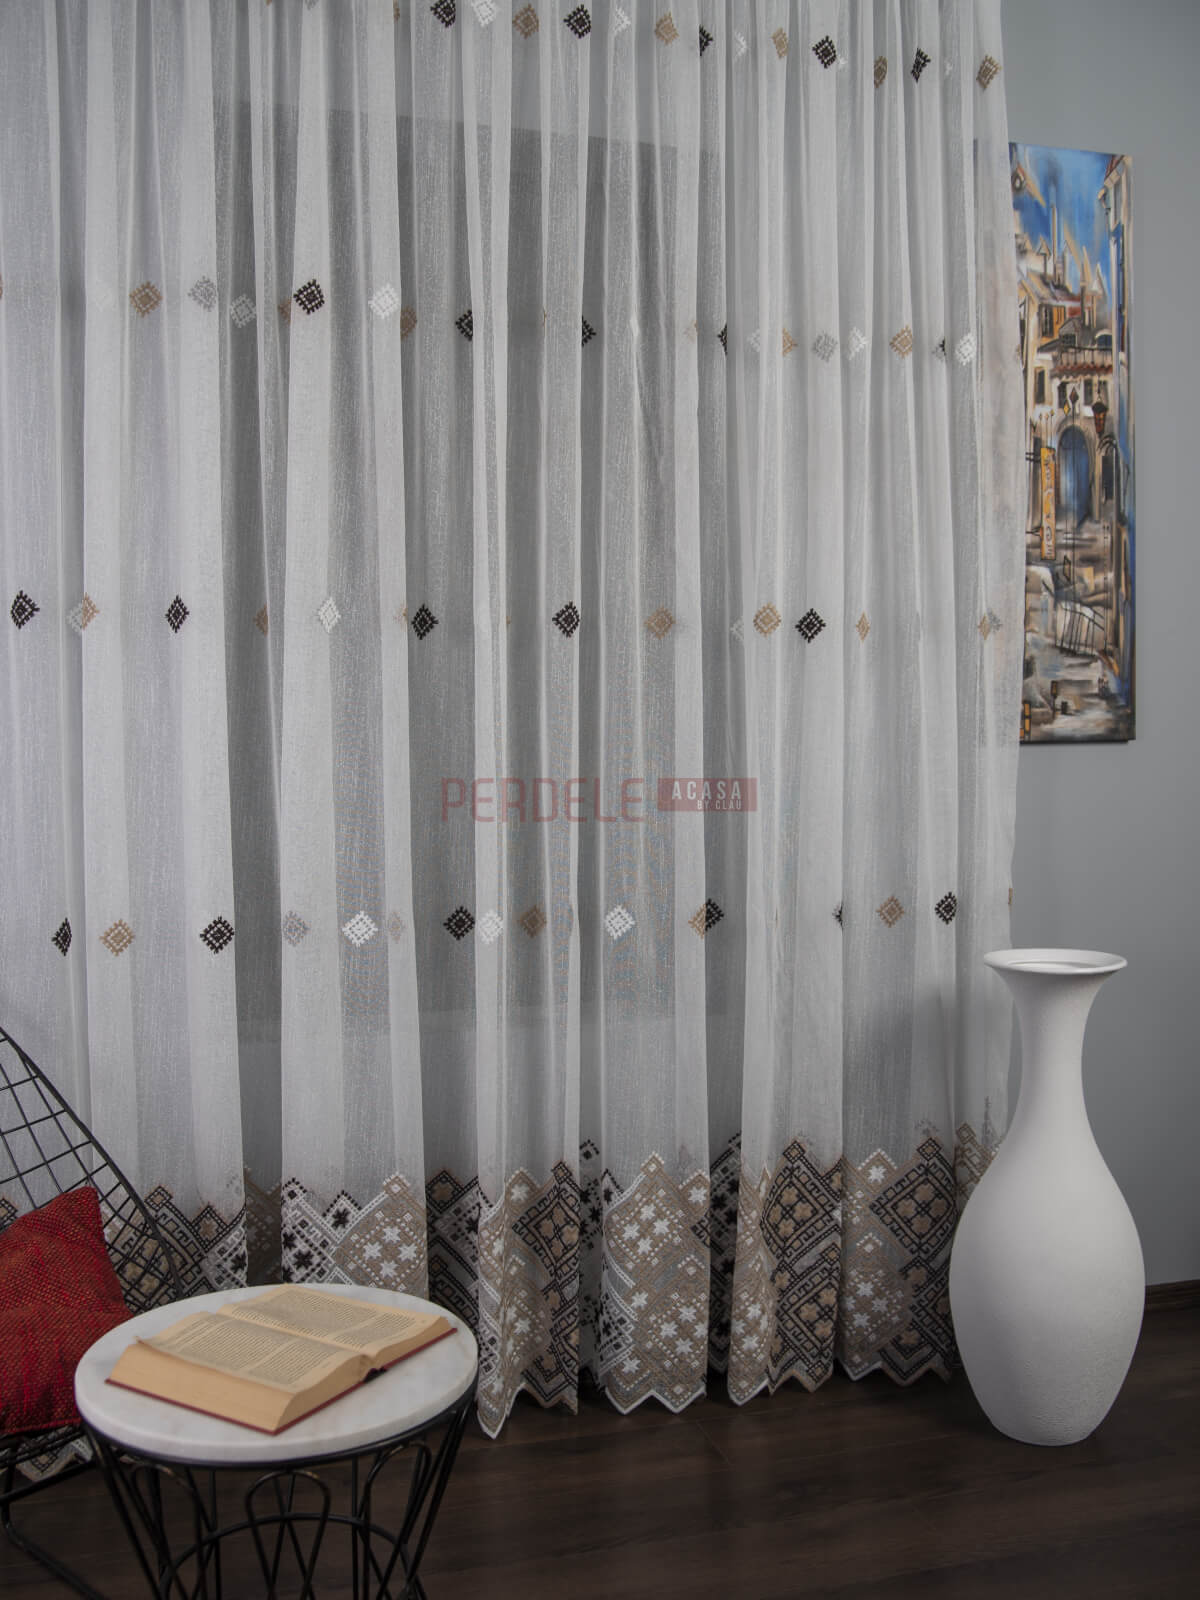 Perdea borangic, inspiratie traditioal Romaneasca, ivoire/bej/maro